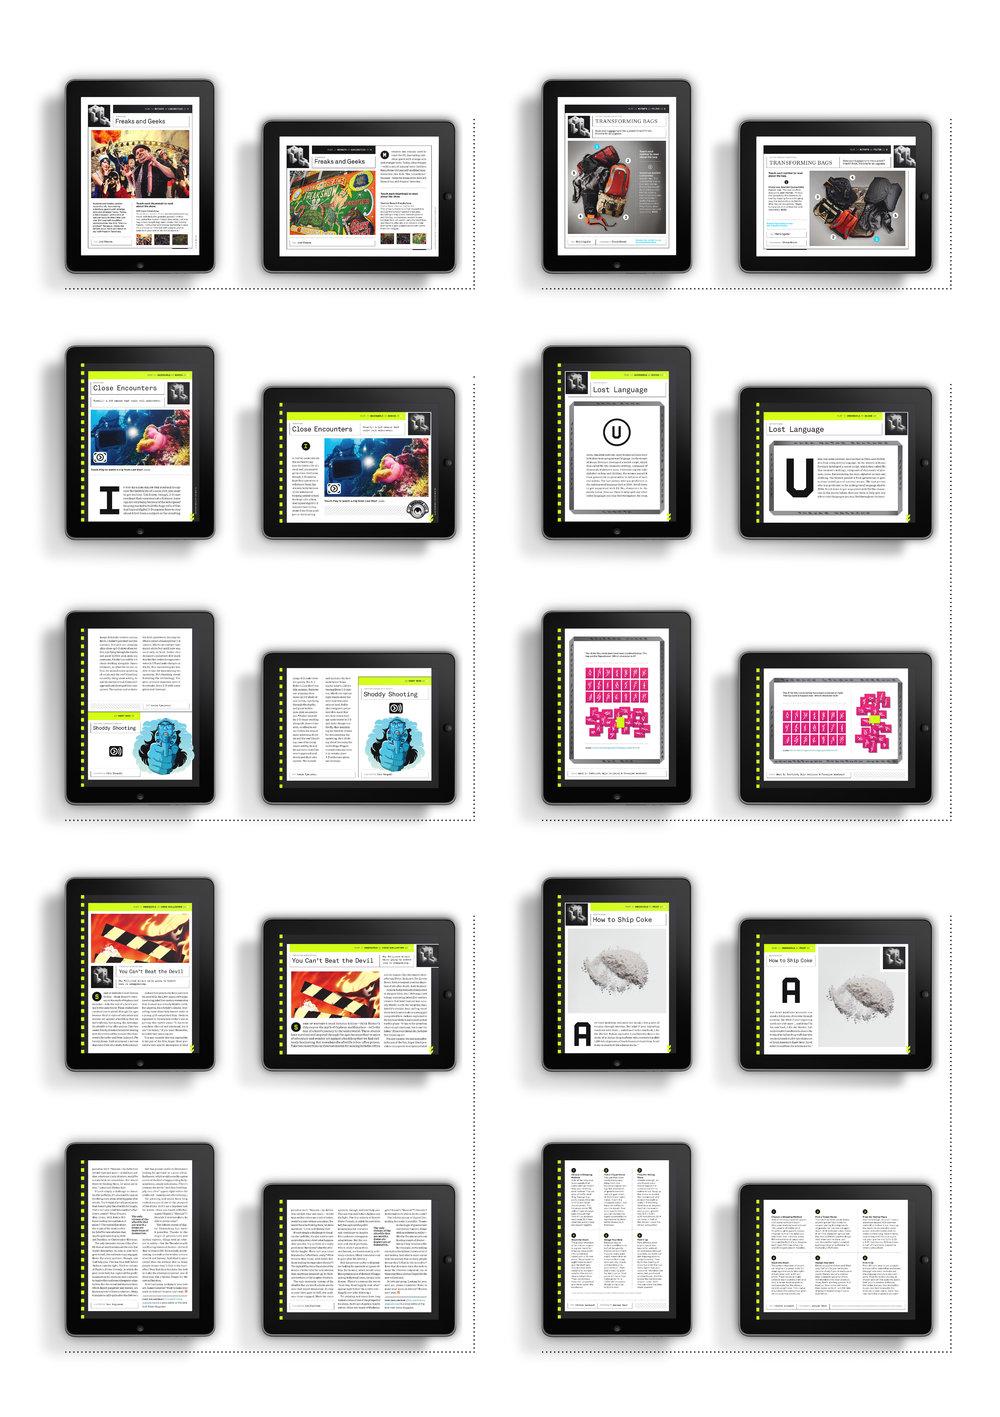 Penny_Lorber_WIRED_iPad_12.jpg